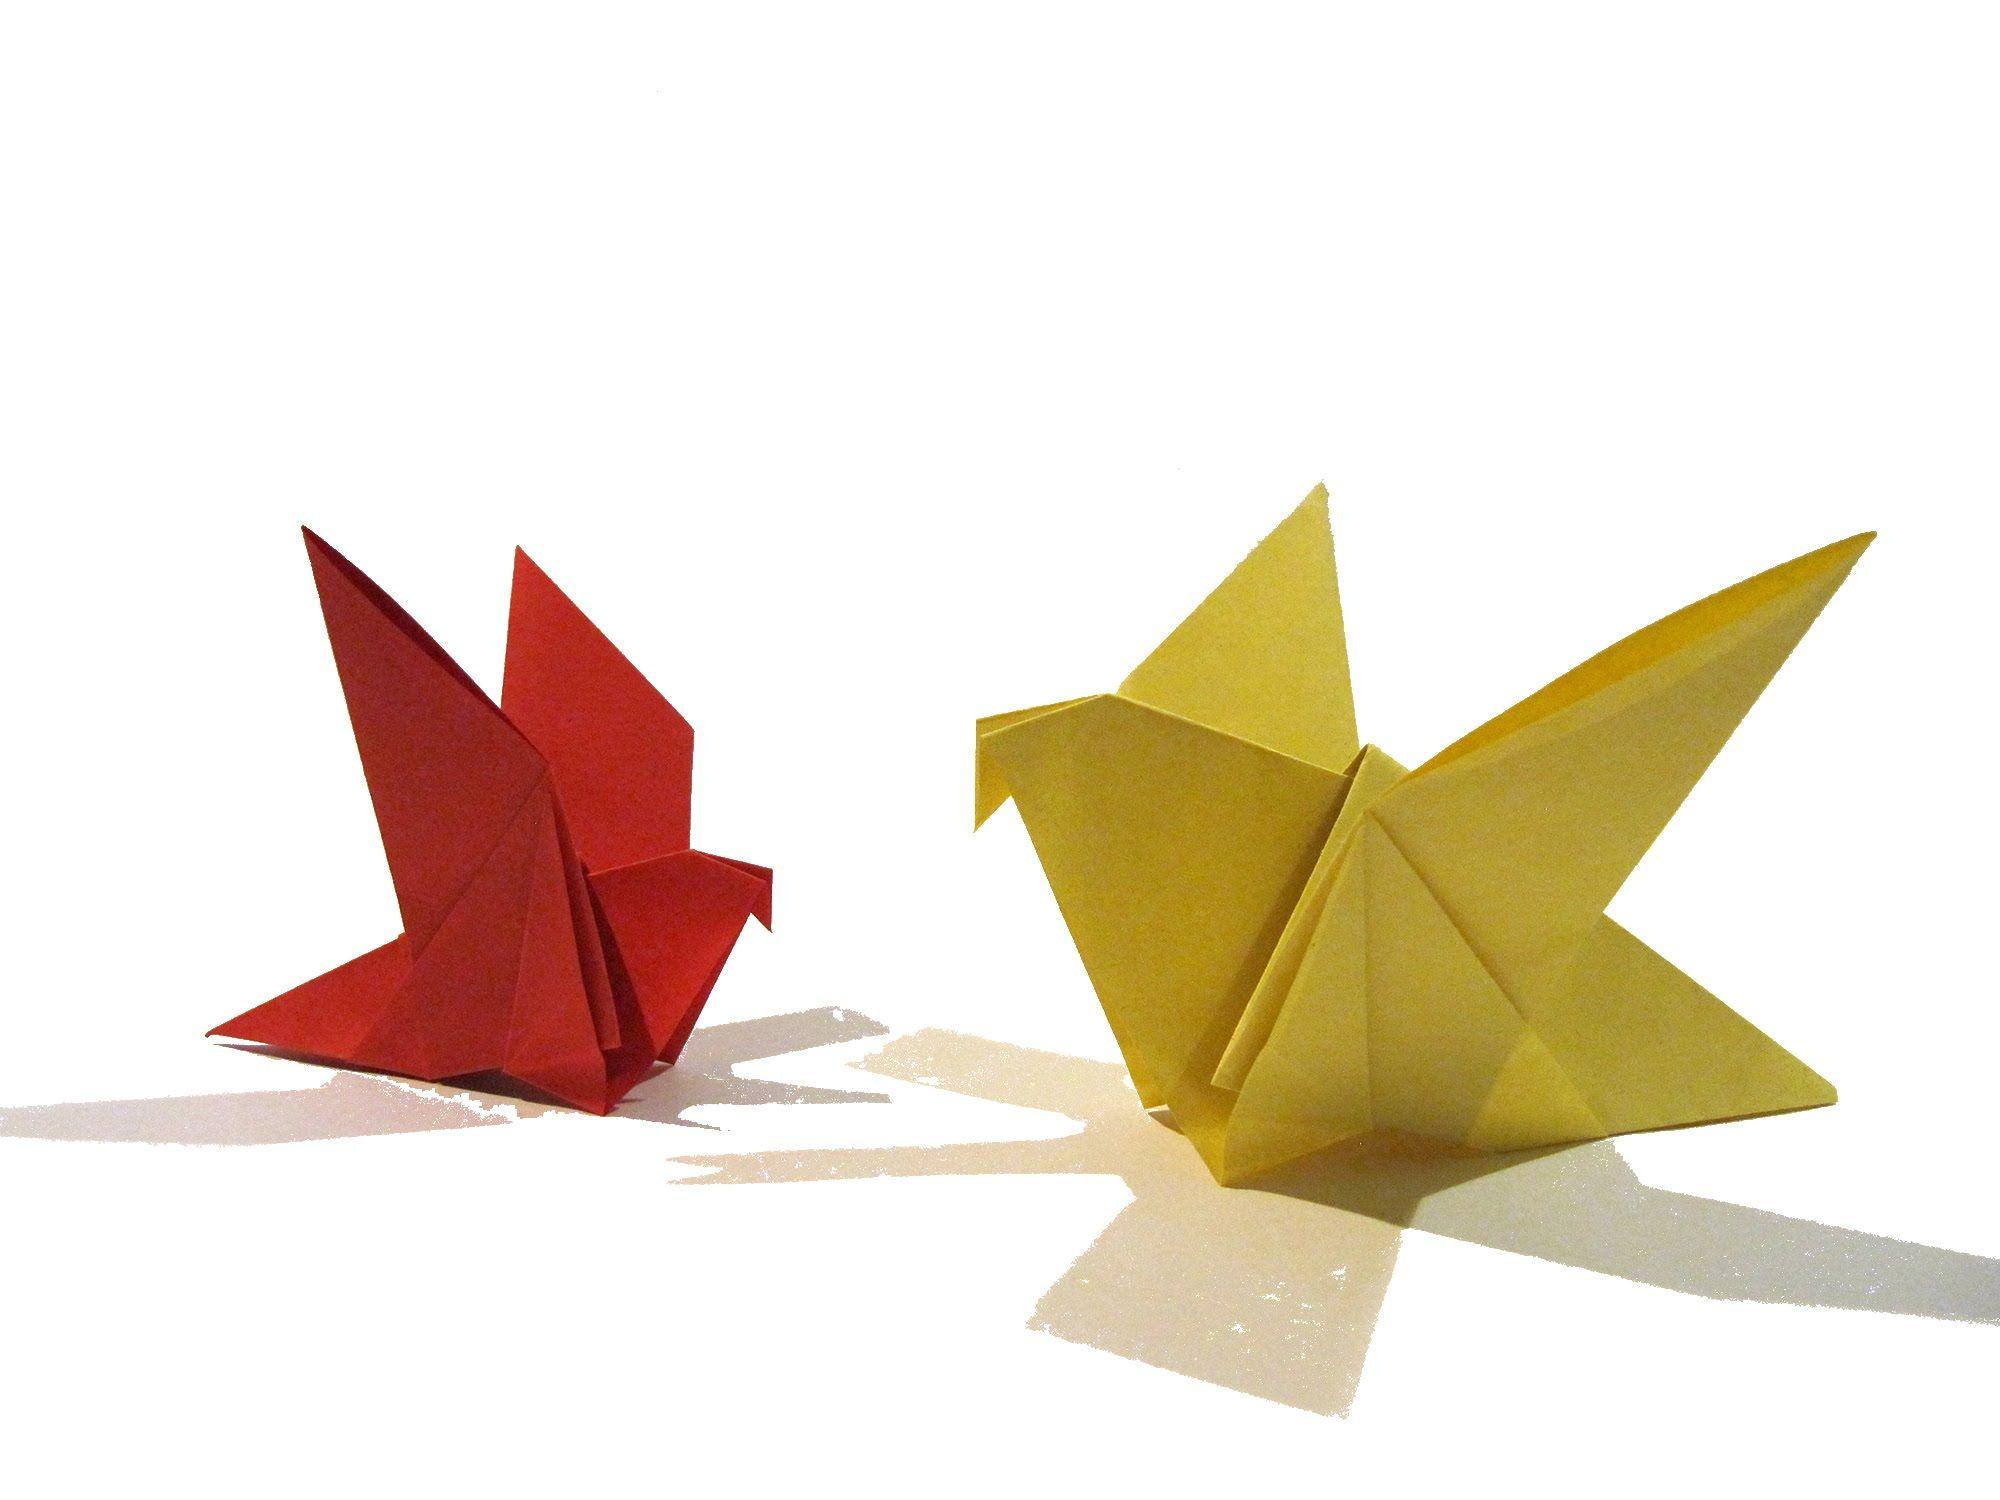 27 Inspired Photo Of Origami Tutorial Easy Dogeasy Dogorigami Dog Diagrammoney Easter Bird